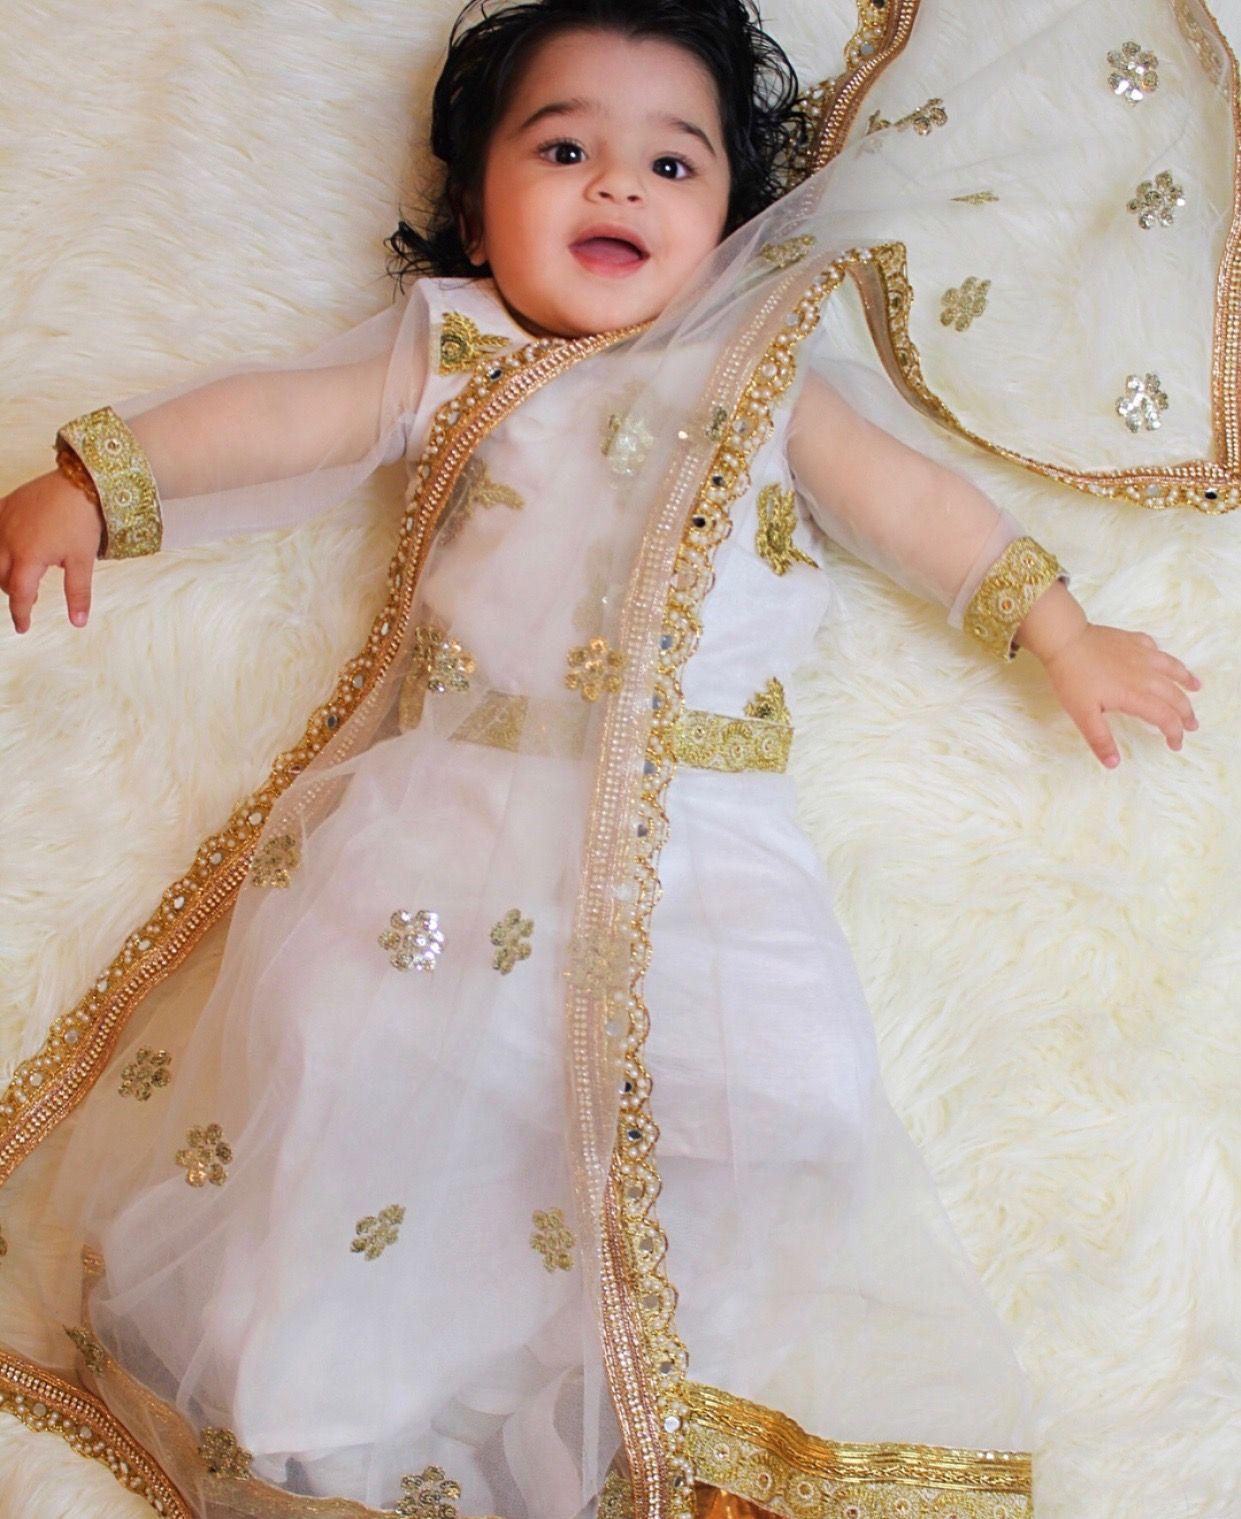 Custom baby outfit for this little diva Sahiba, made by Lashkaraa